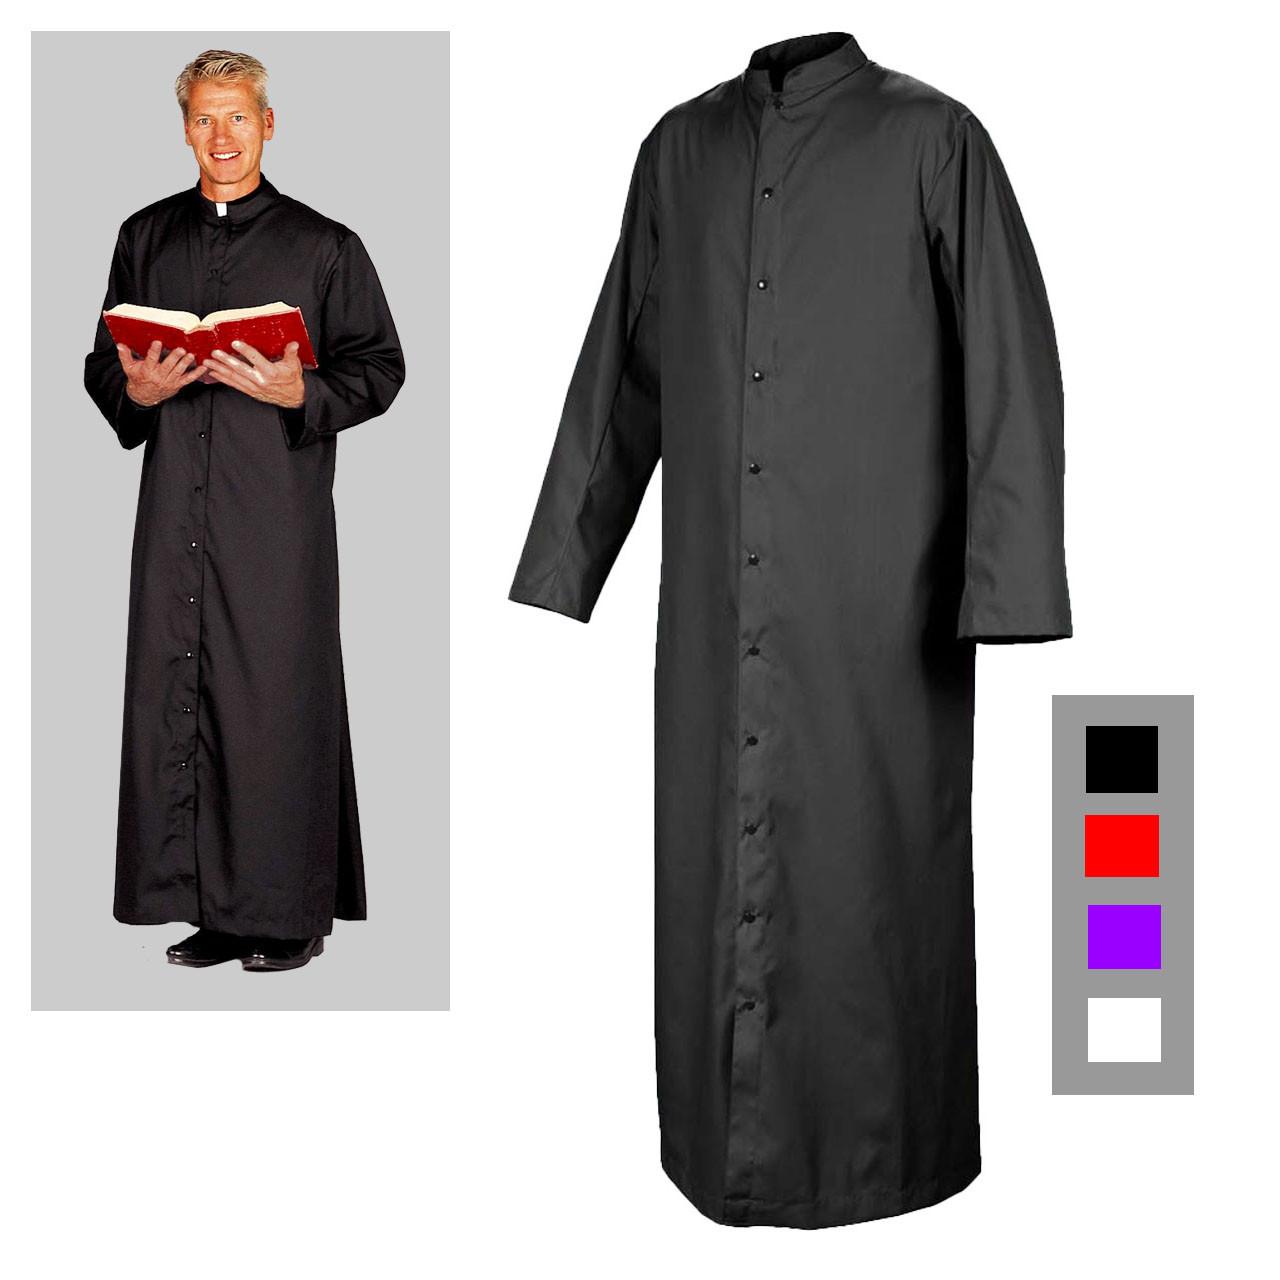 216S Adult Server & Priest Cassock